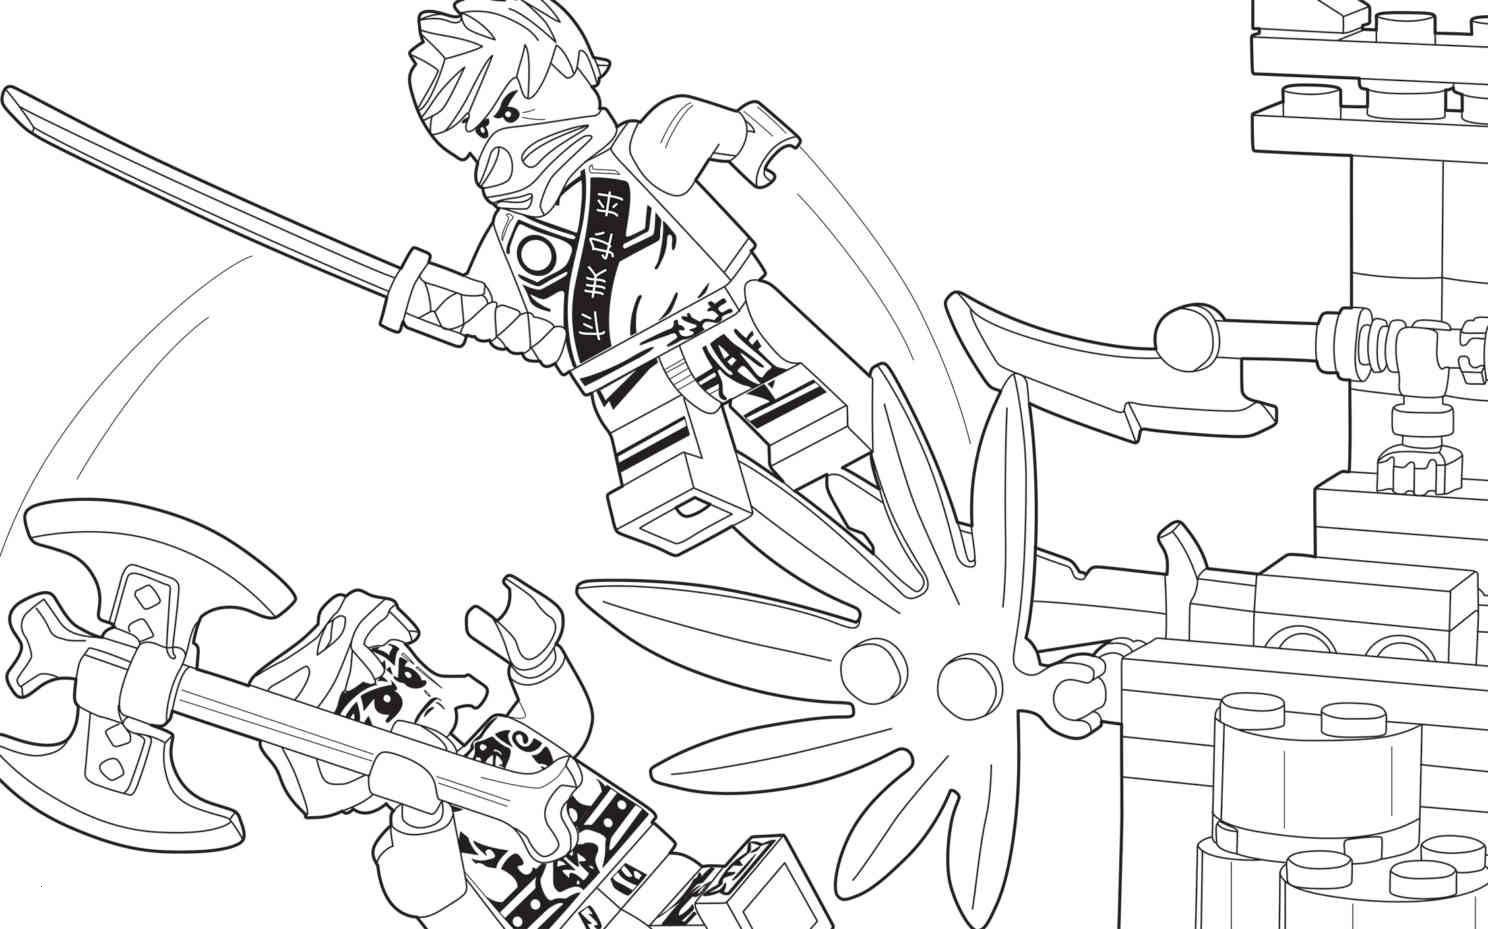 Ausmalbild Lego Elves Frisch 37 Lego Ninjago Malvorlagen Scoredatscore Genial Ausmalbilder Lego Sammlung